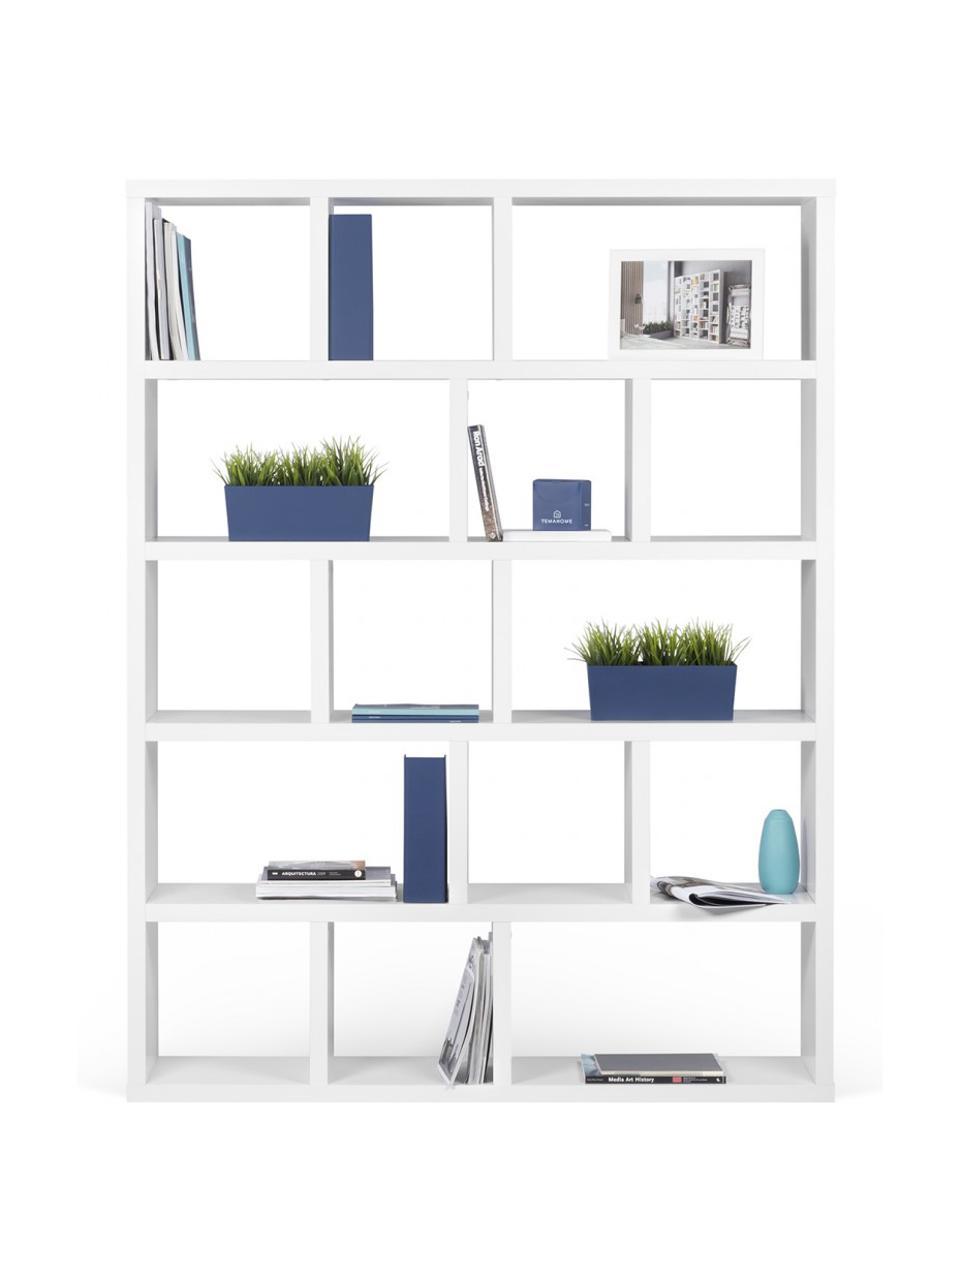 Großes Bücherregal Portlyn in Weiß, Oberfläche: Melaminschicht., Weiß, matt, 150 x 198 cm